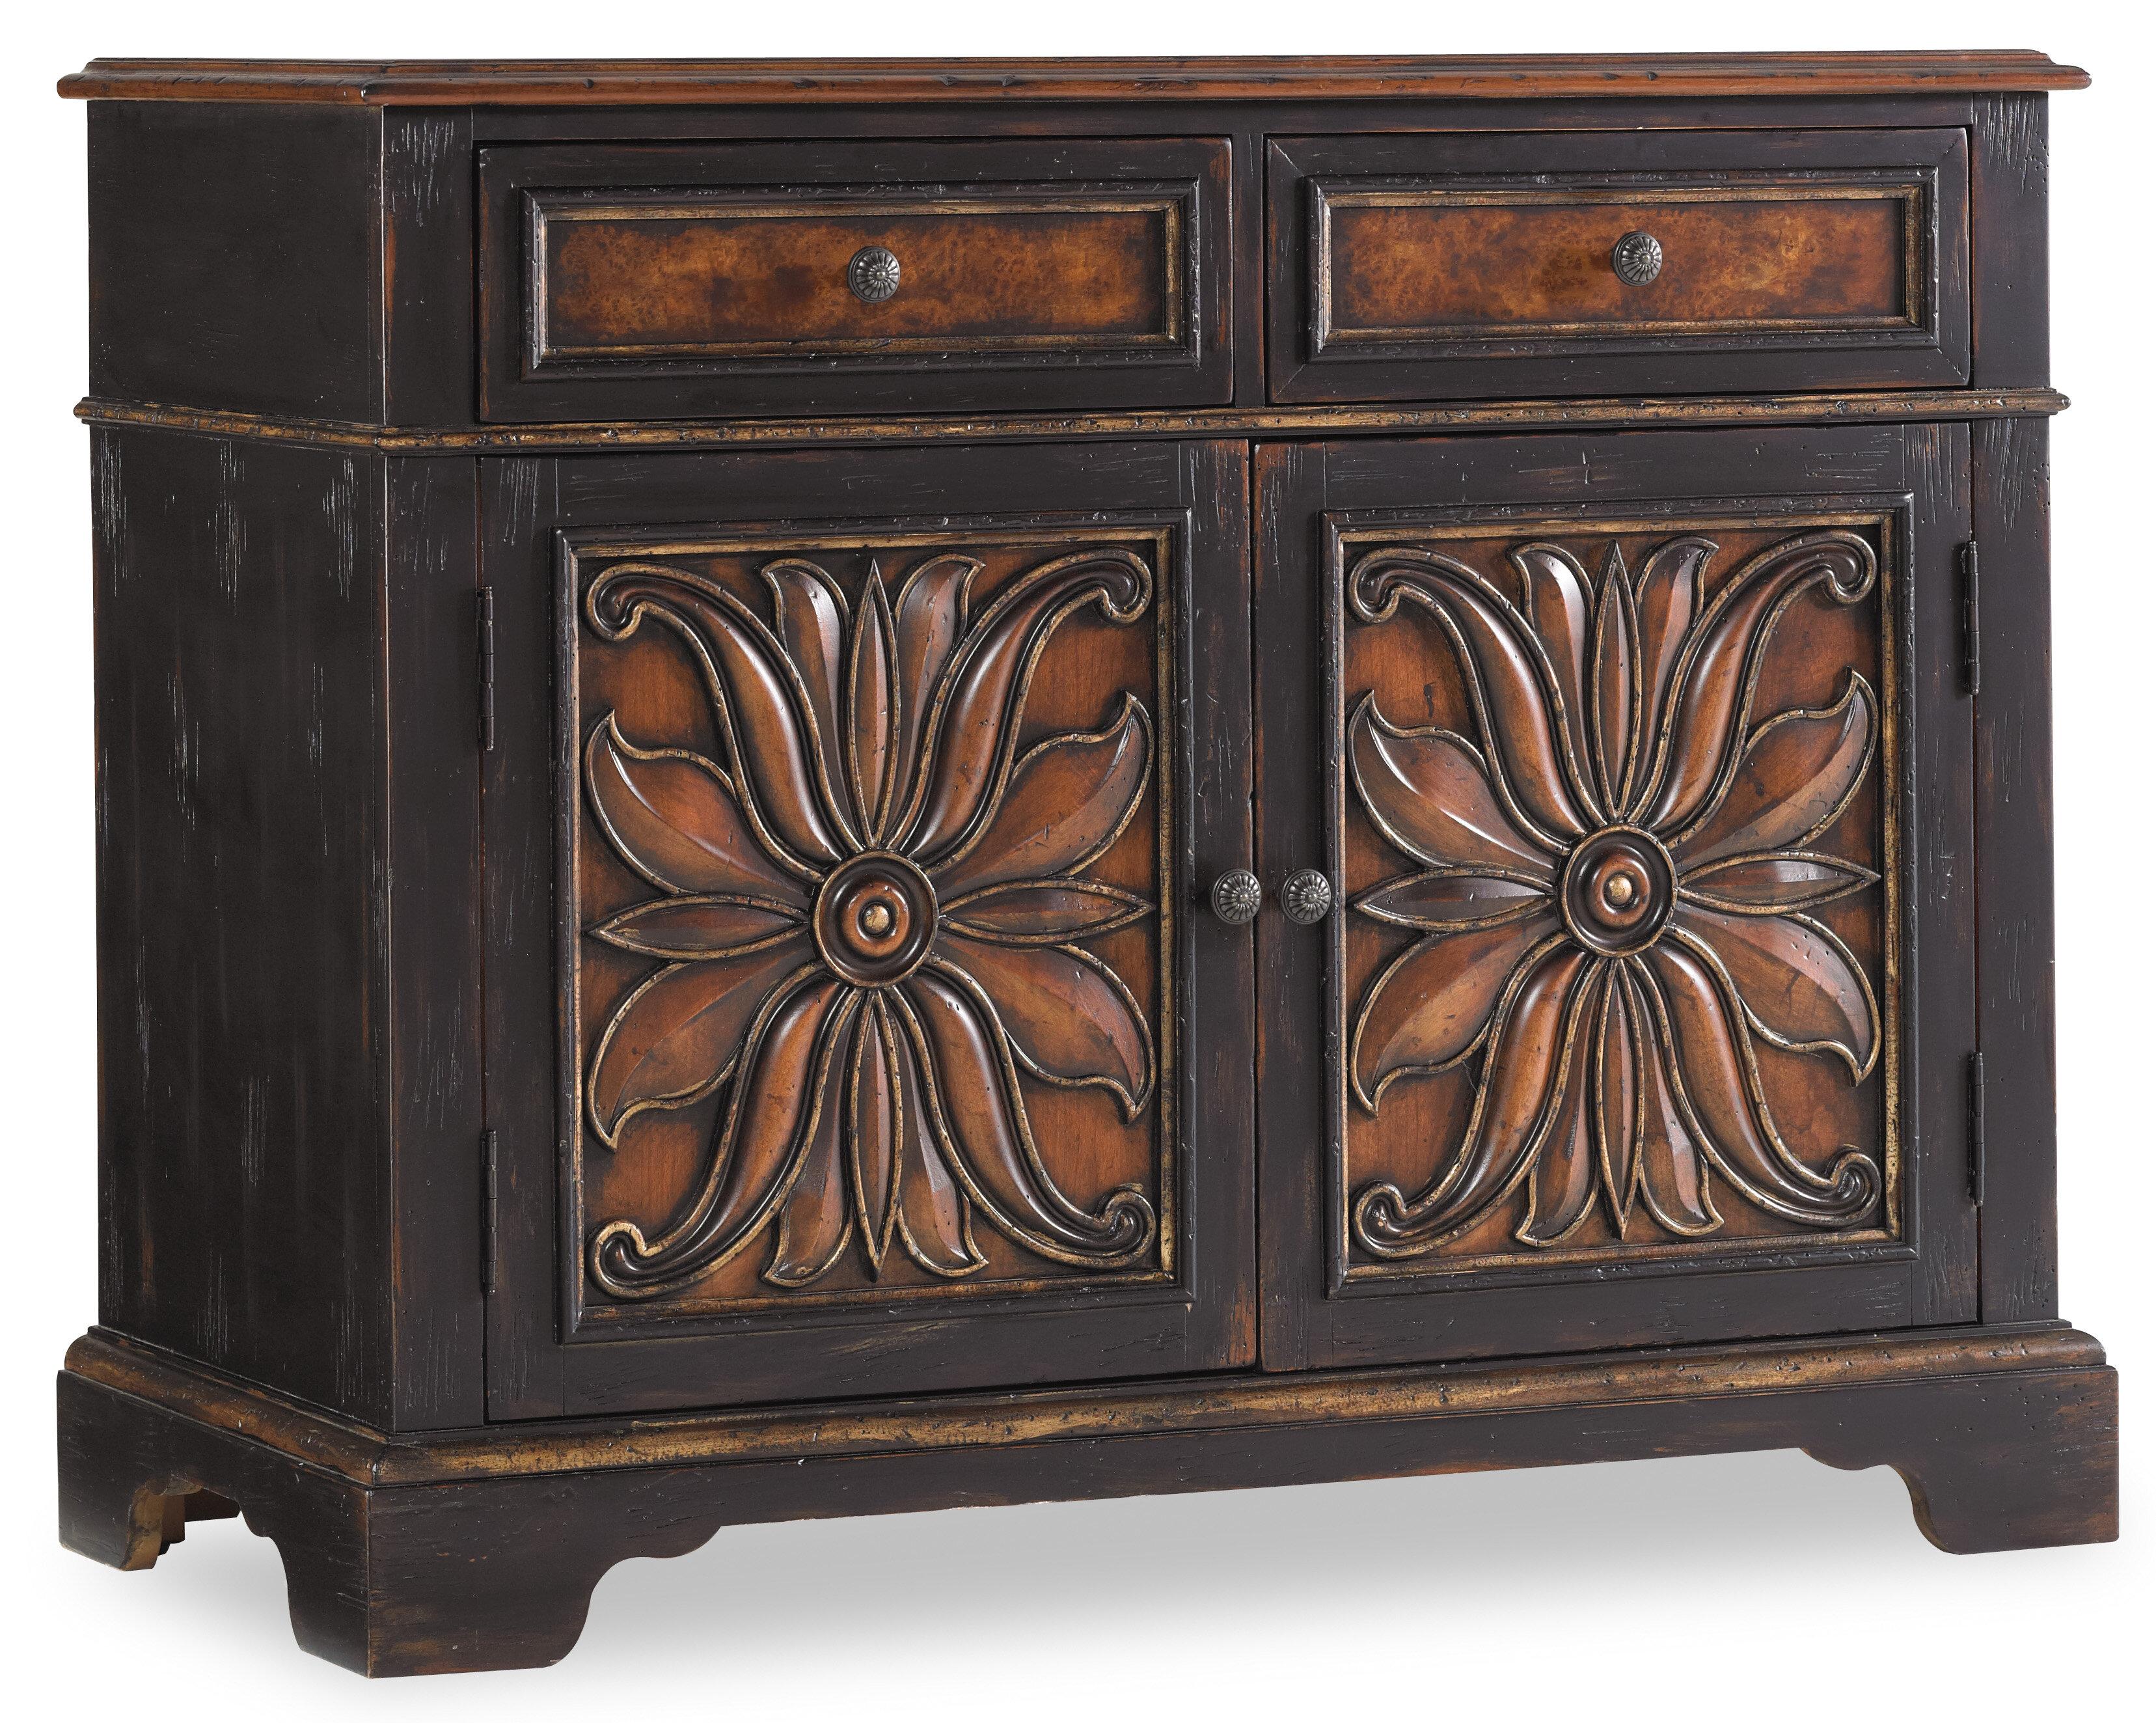 Hooker Furniture Grandover 2 Drawer 2 Door Accent Cabinet Reviews Perigold